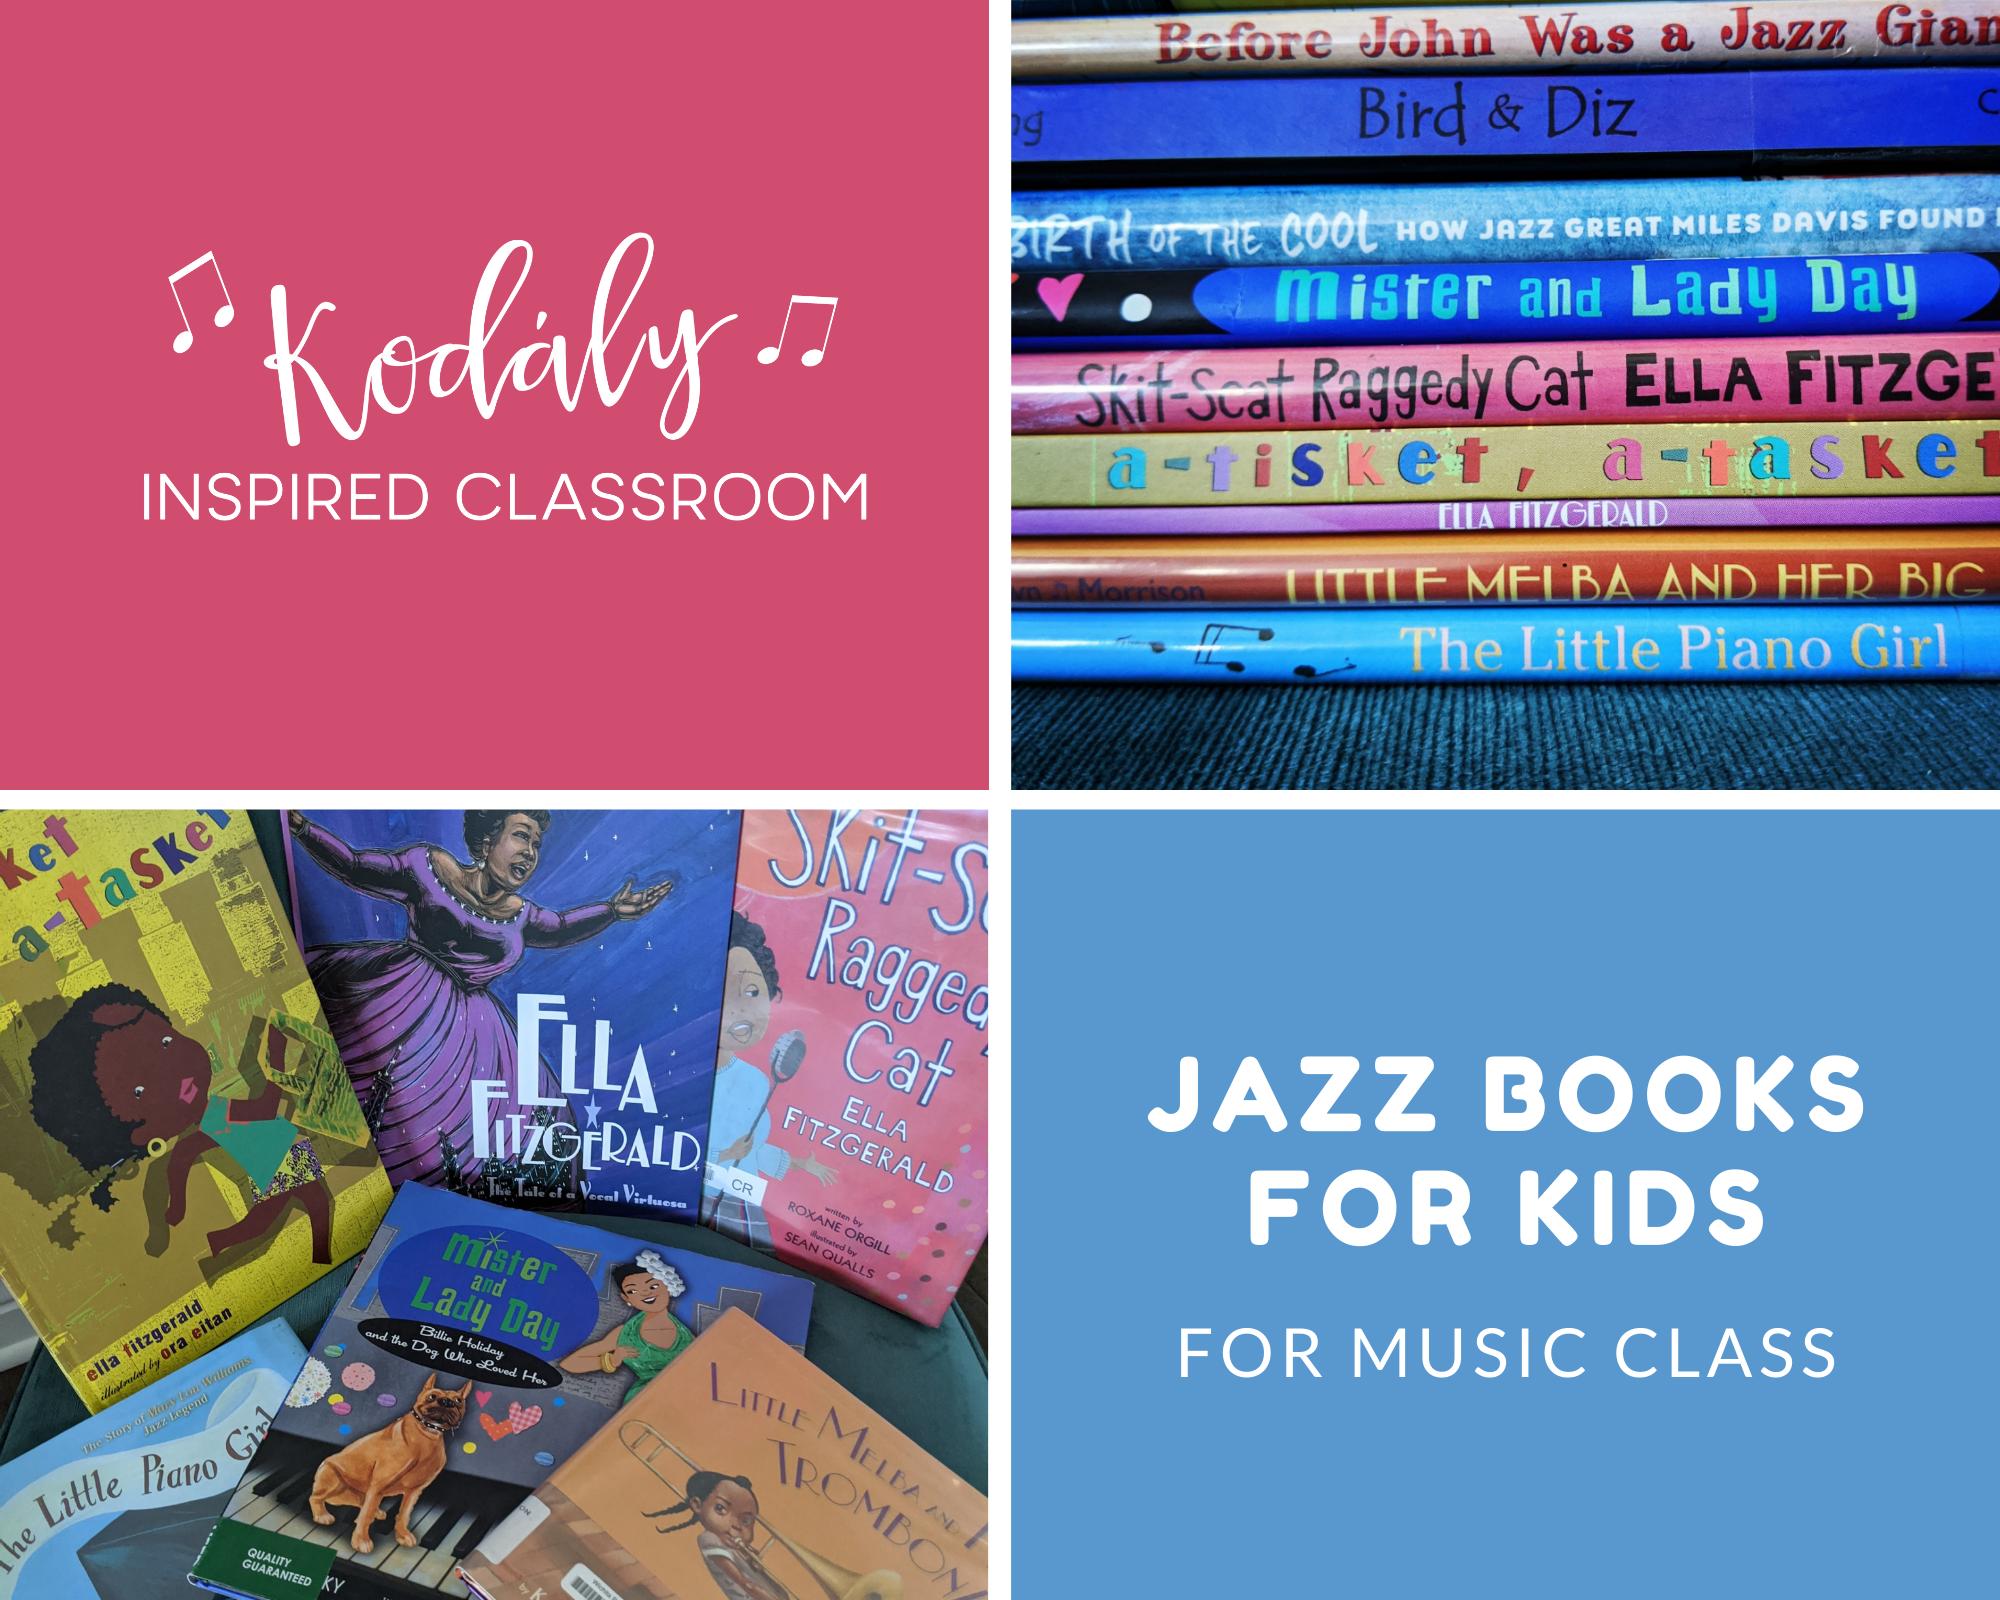 medium resolution of Kodaly Inspired Classroom